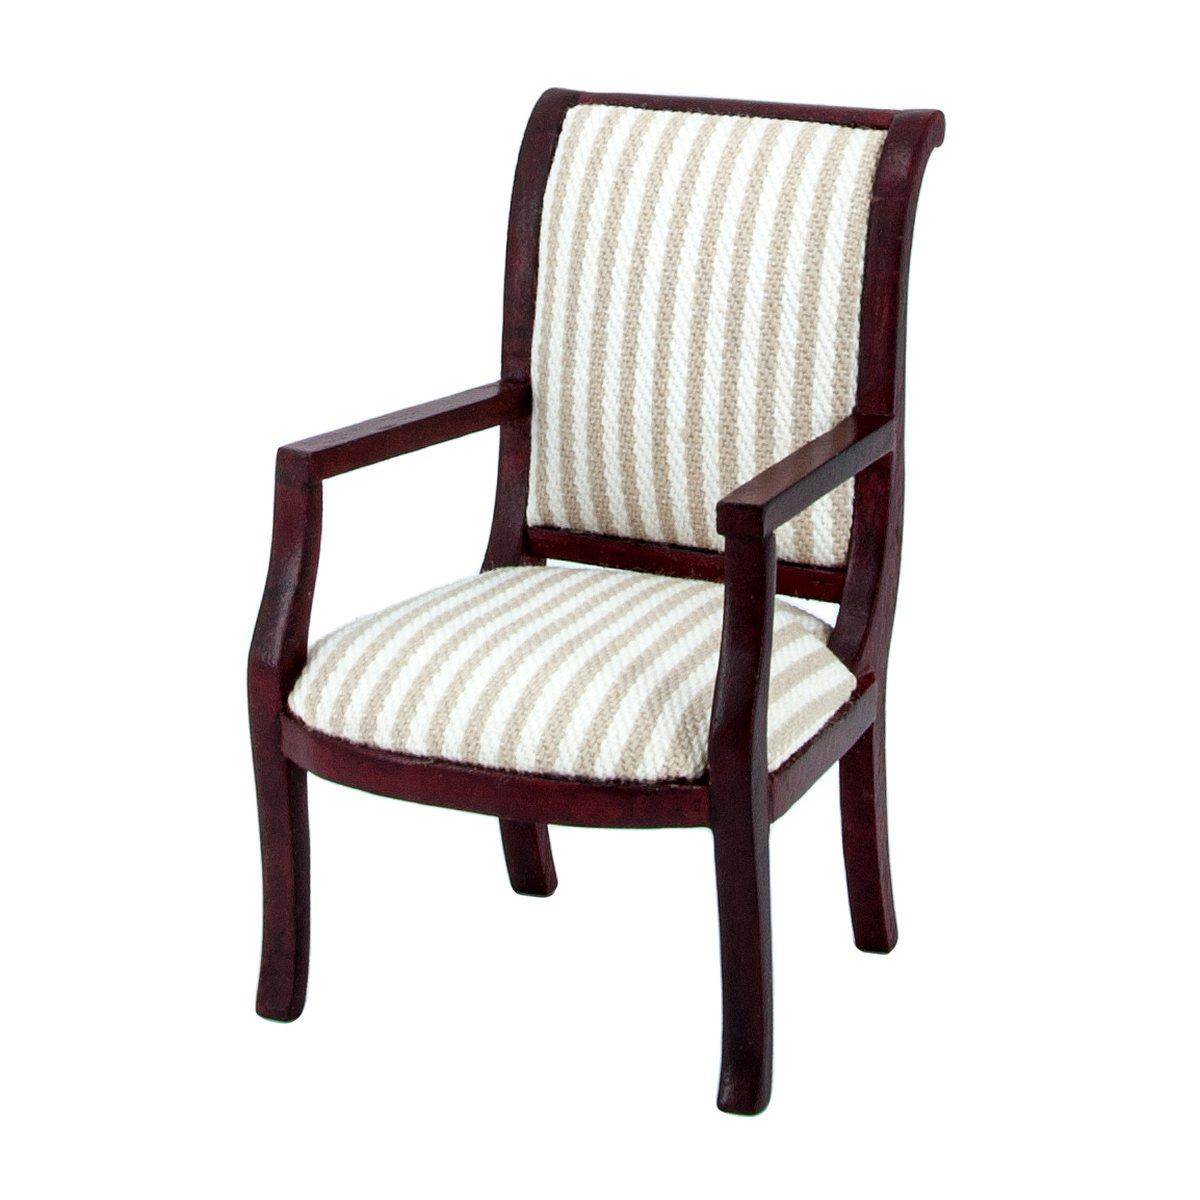 Stuhl mit Armlehnen, Polster gestreift, mahagoni-41855